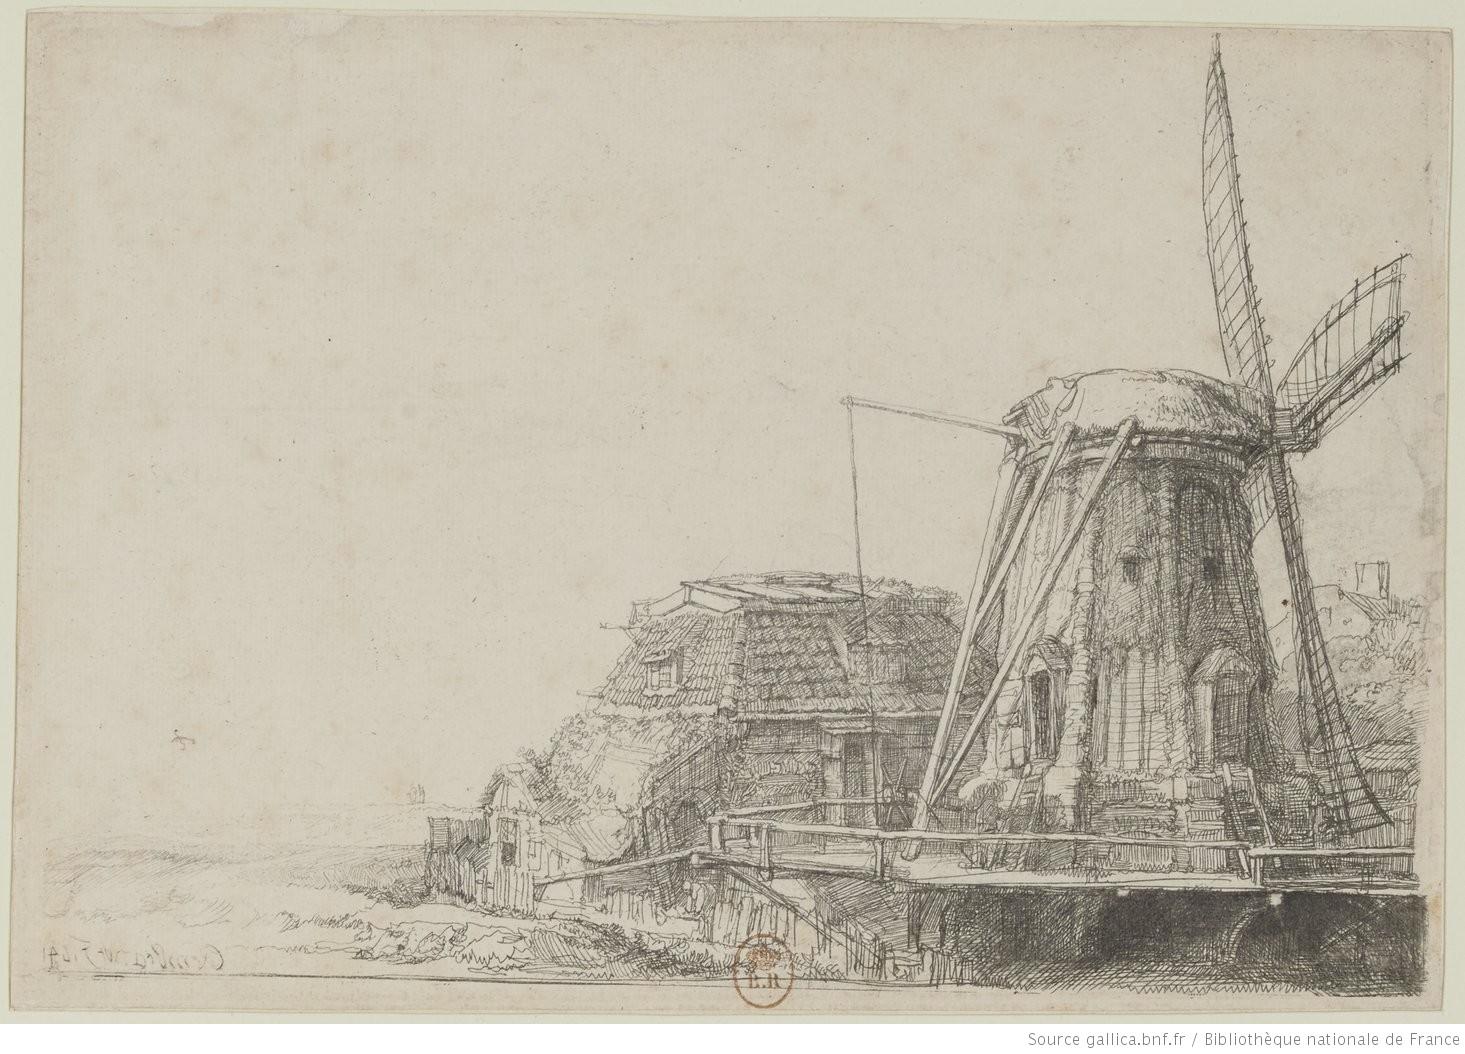 Le moulin] : [estampe] / Rembrandt f. 1641 [sig.] | Gallica